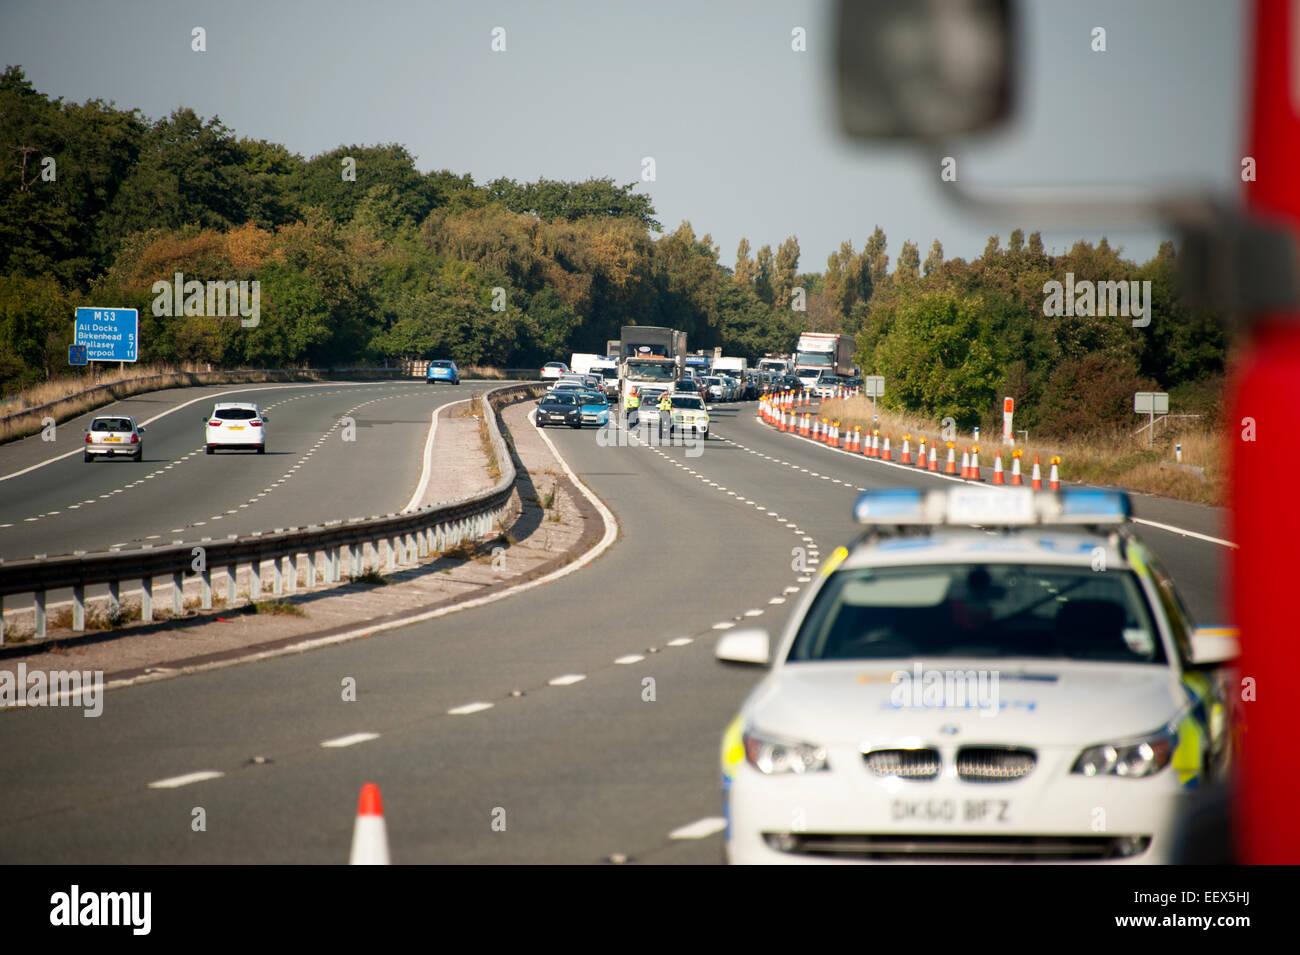 Police Motorway rolling Roadblock Crash RTC Closed - Stock Image